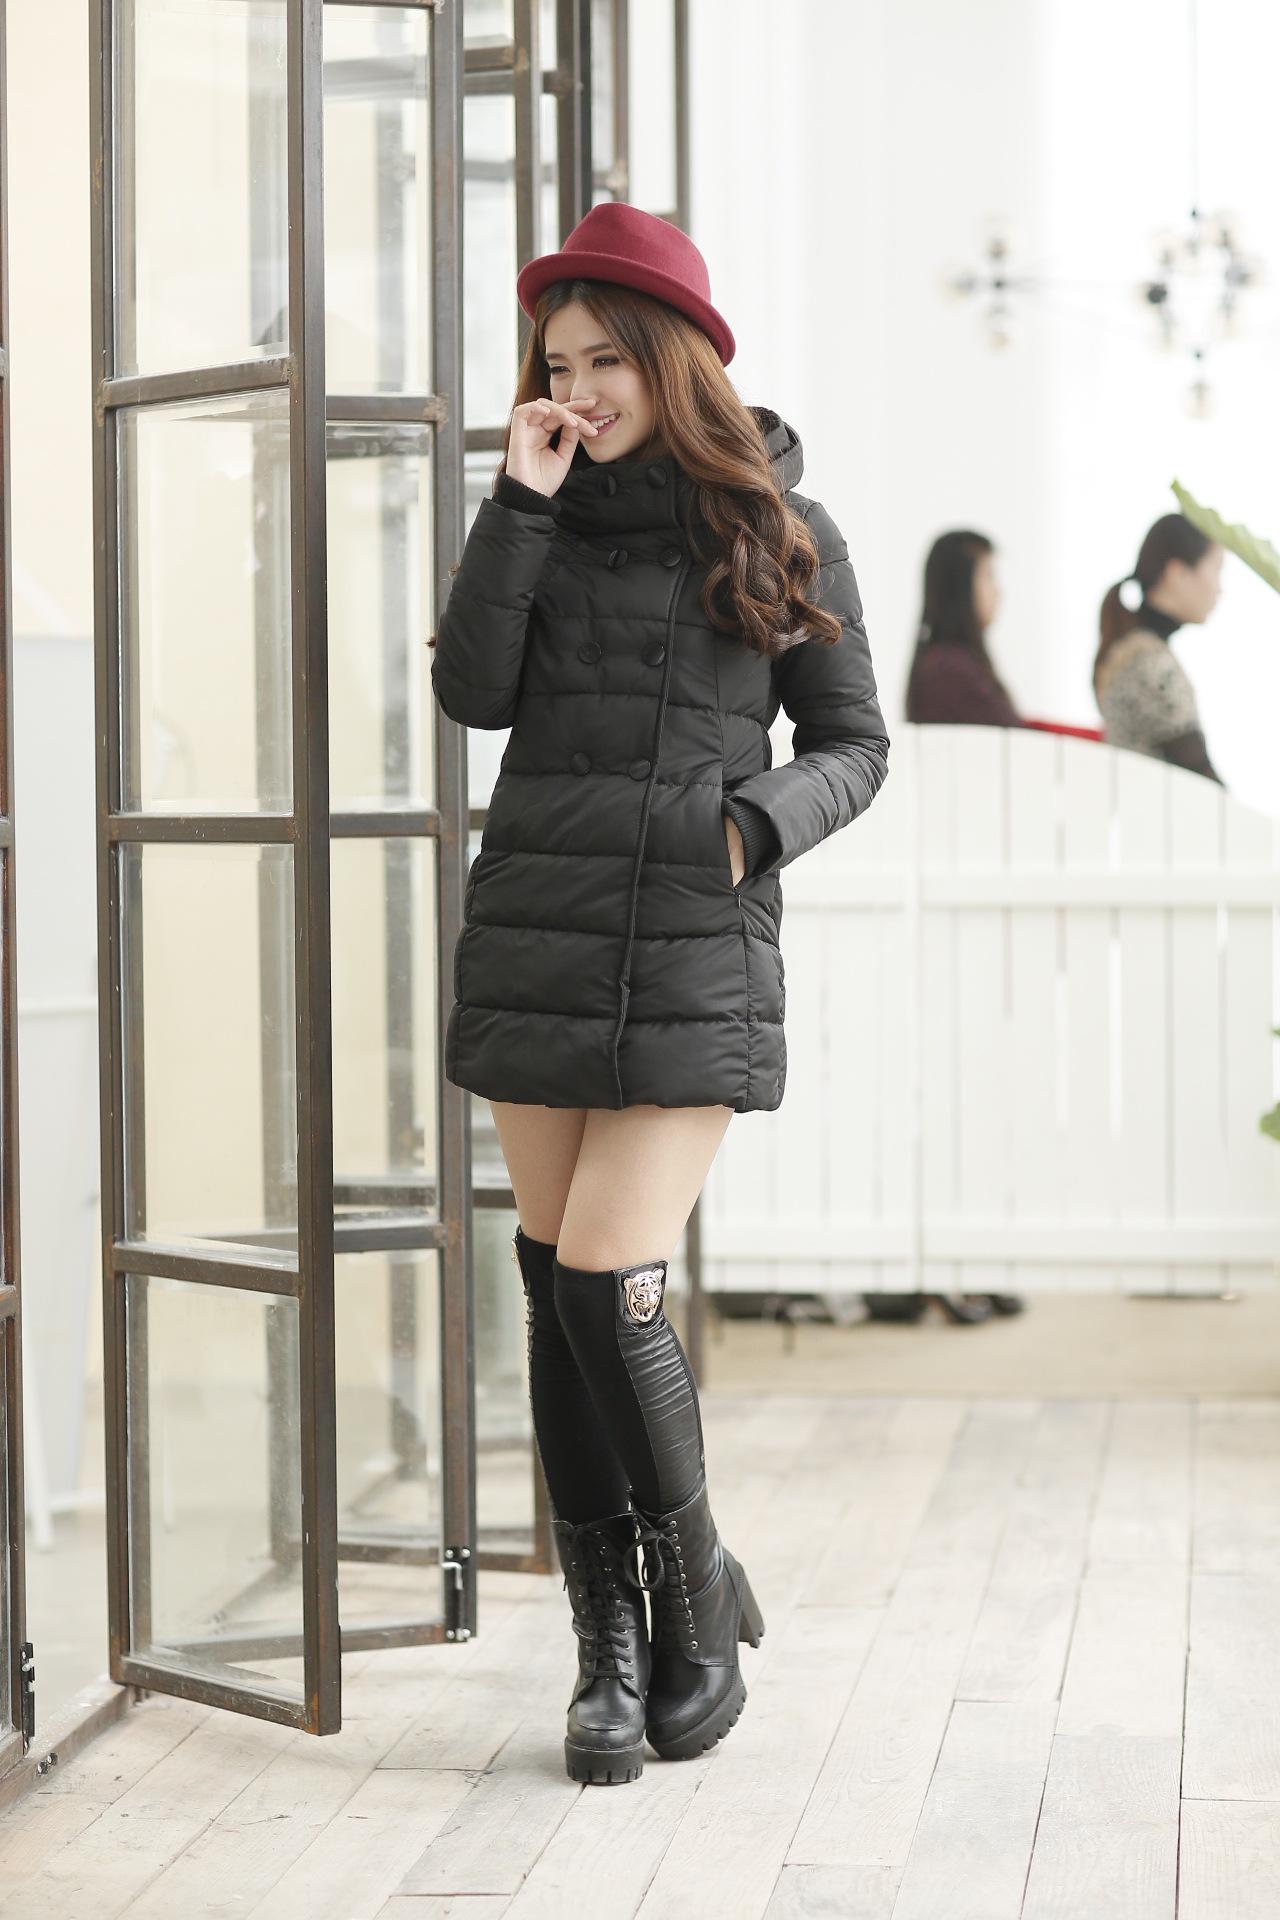 Lady long coat